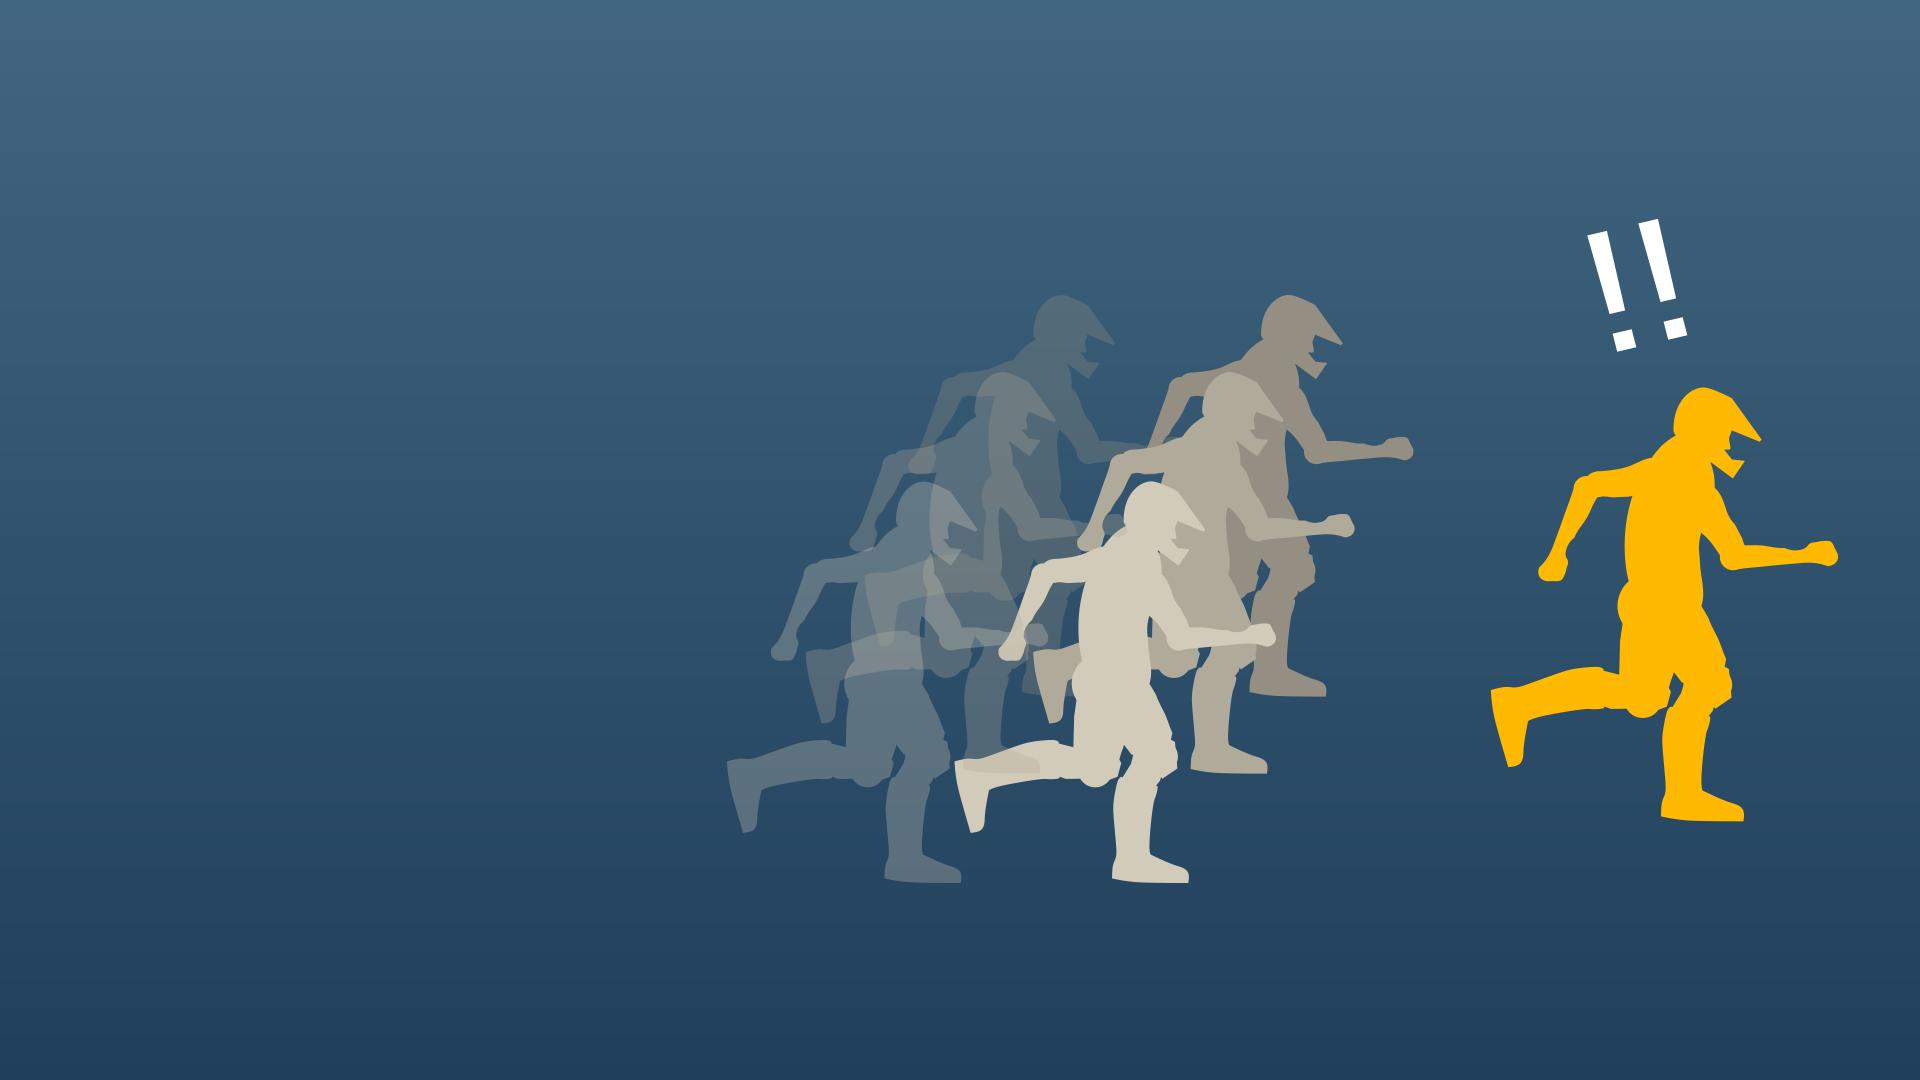 Icon for Attack of the Clone